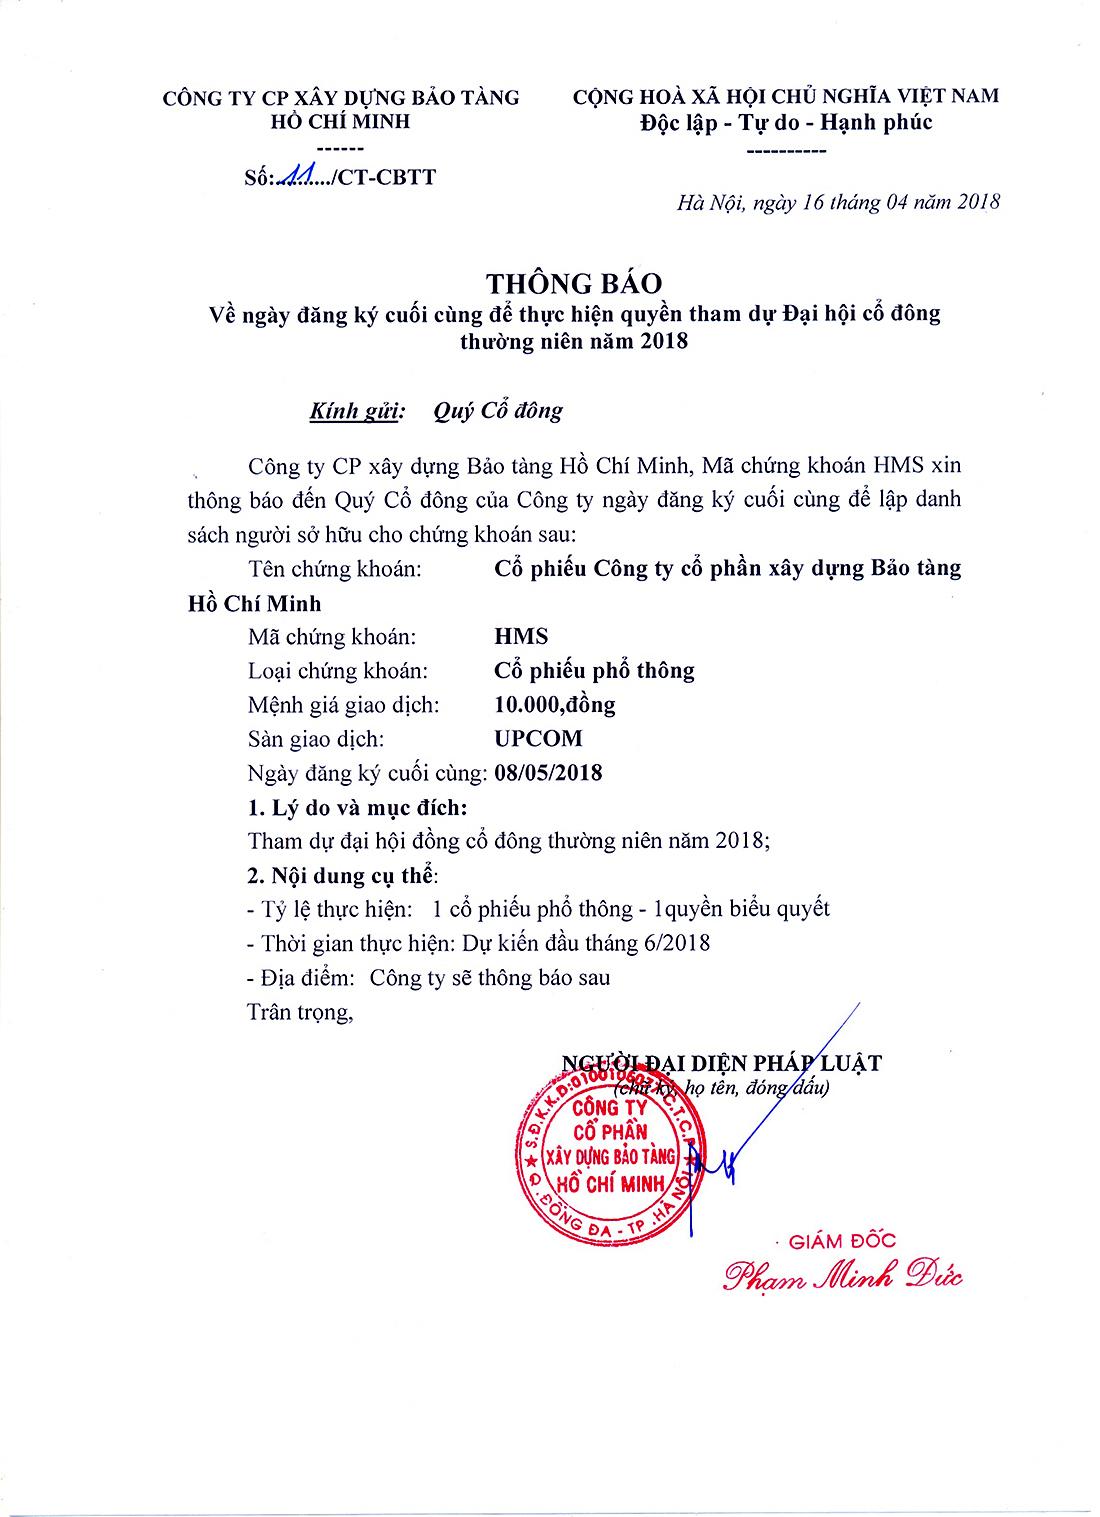 2018 Thong bao ngay dang ky cuoi cung